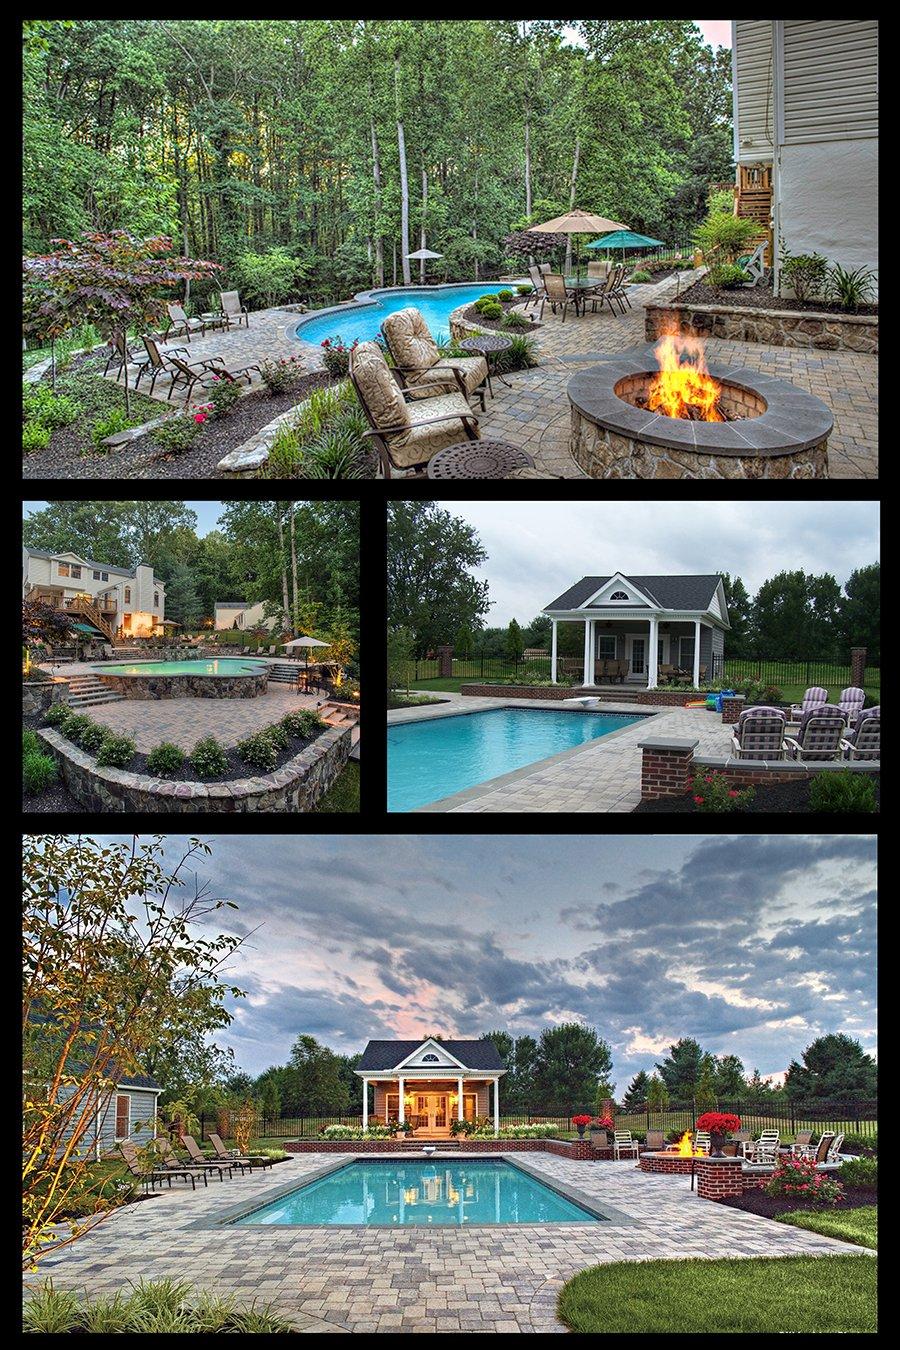 Incredible backyard upgrades and outdoor living